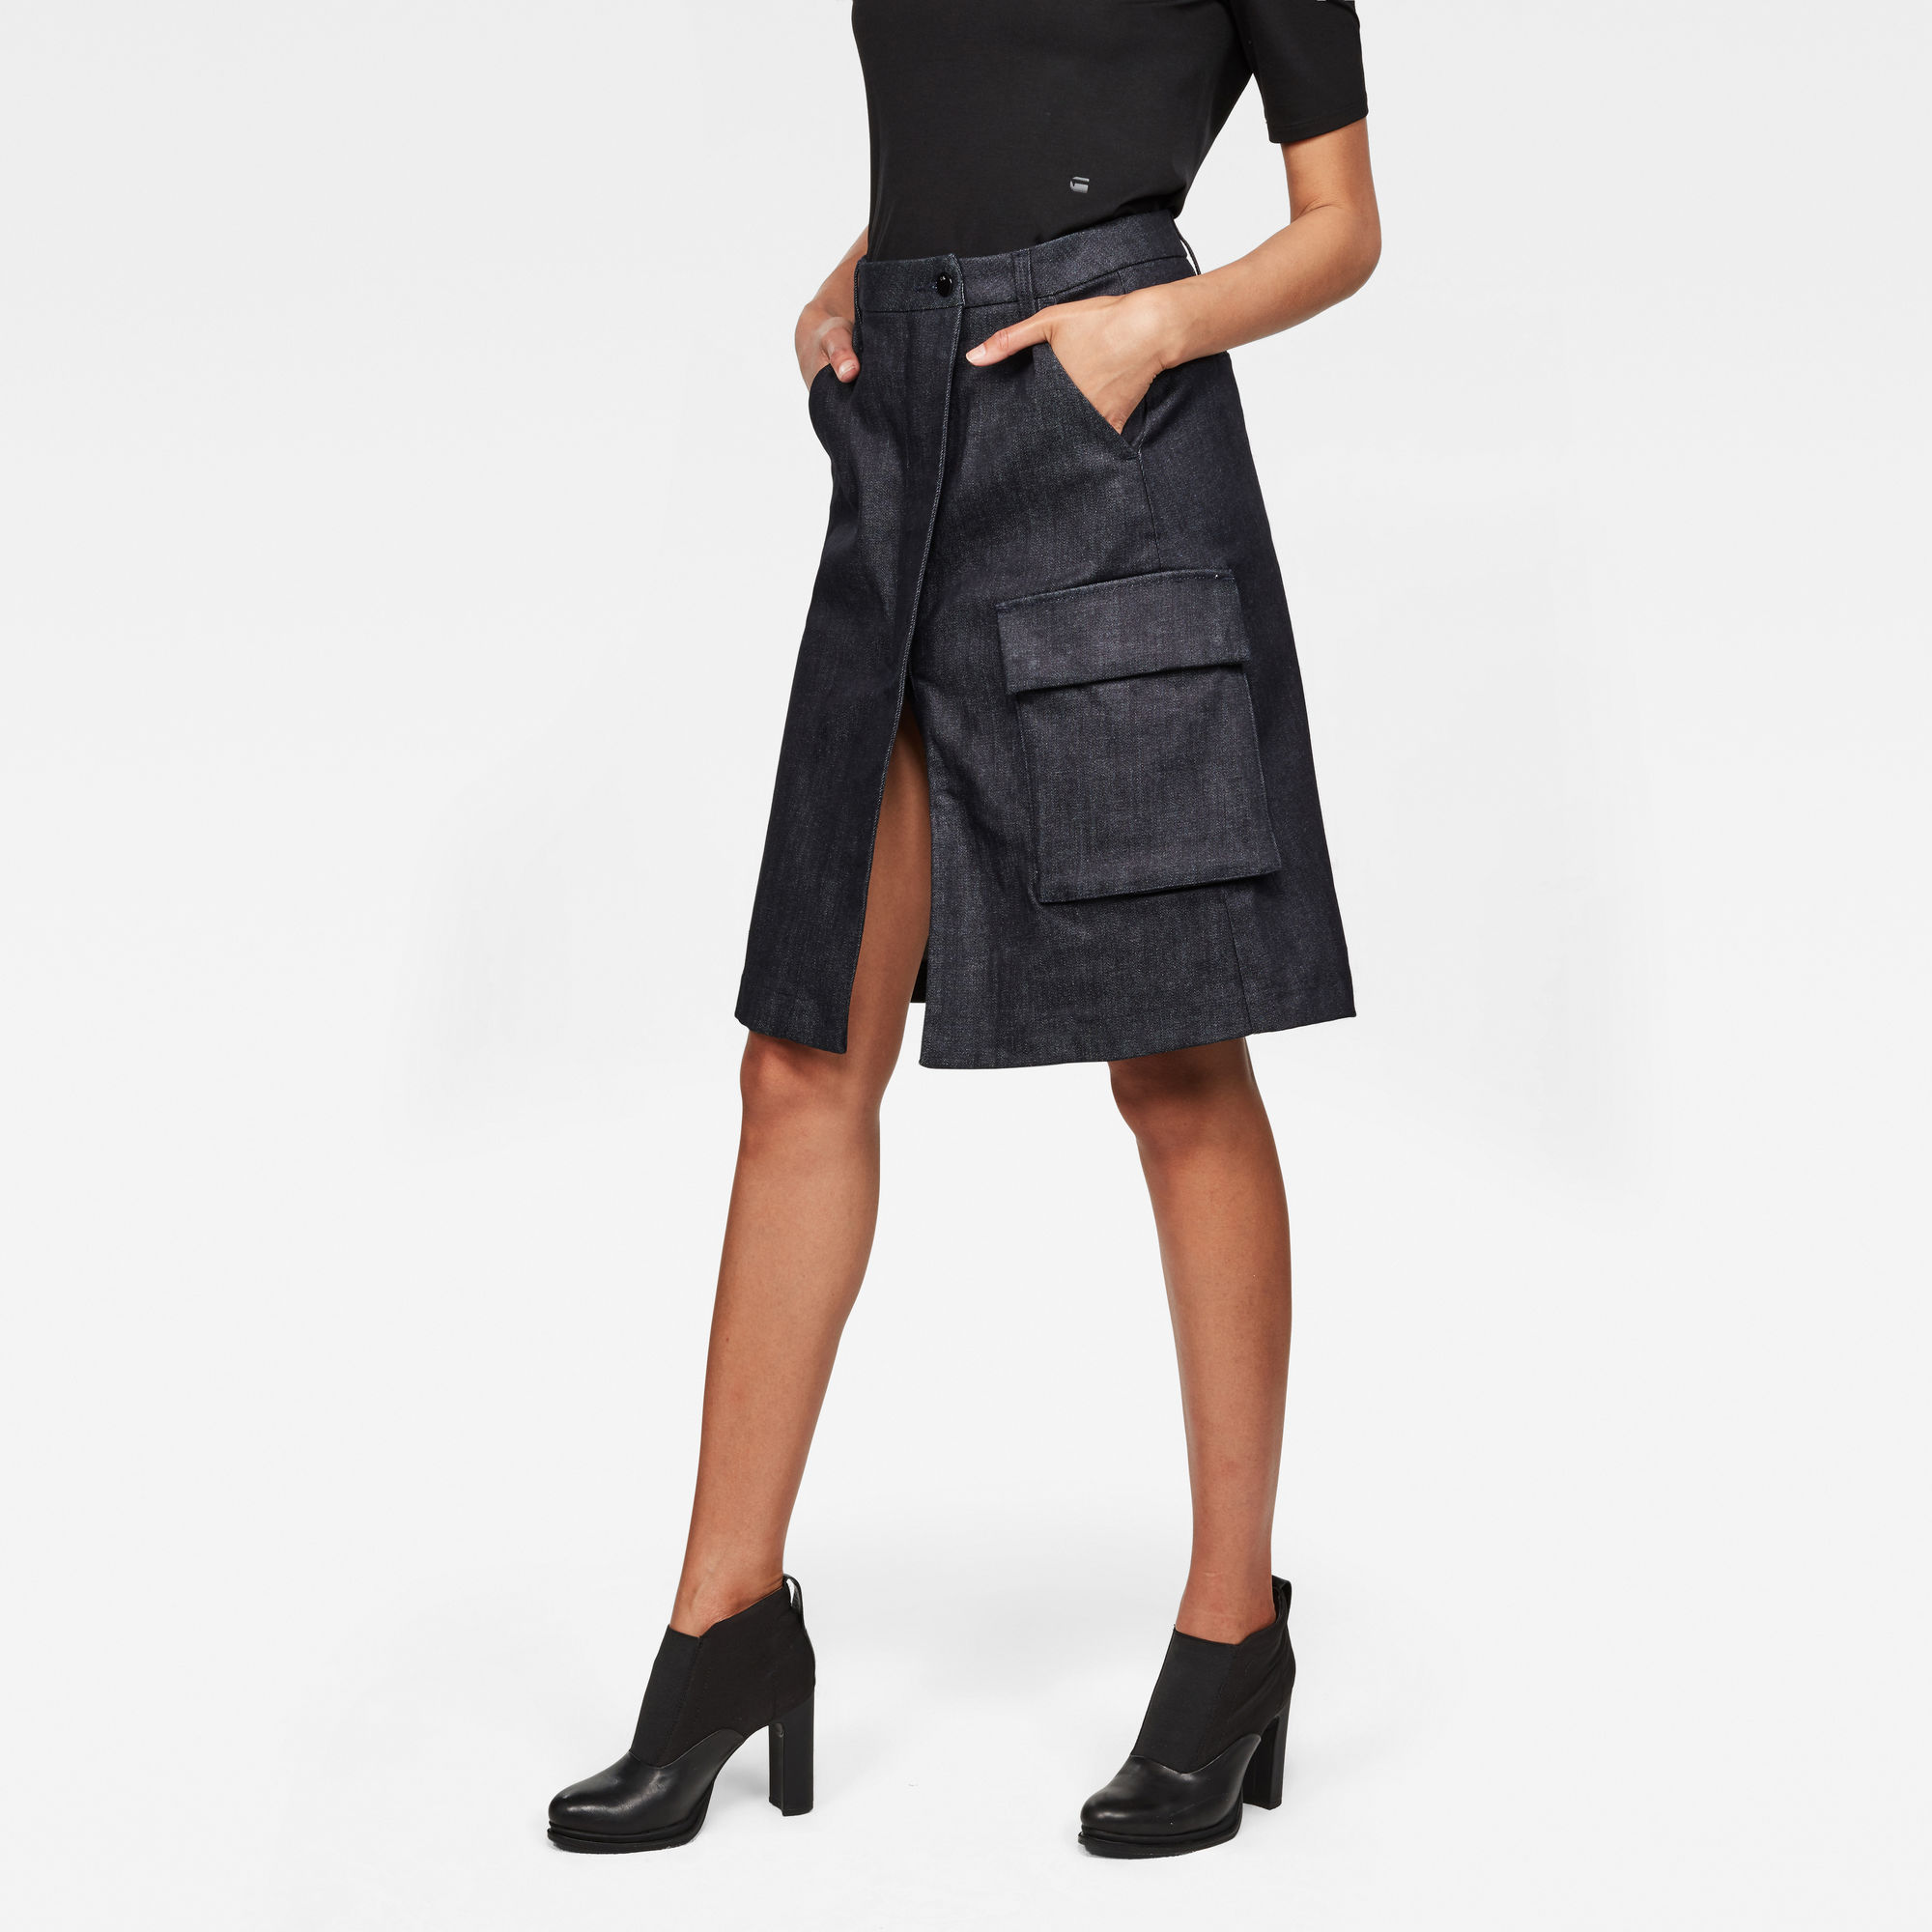 Image of G Star Raw Vodan Wrap Skirt